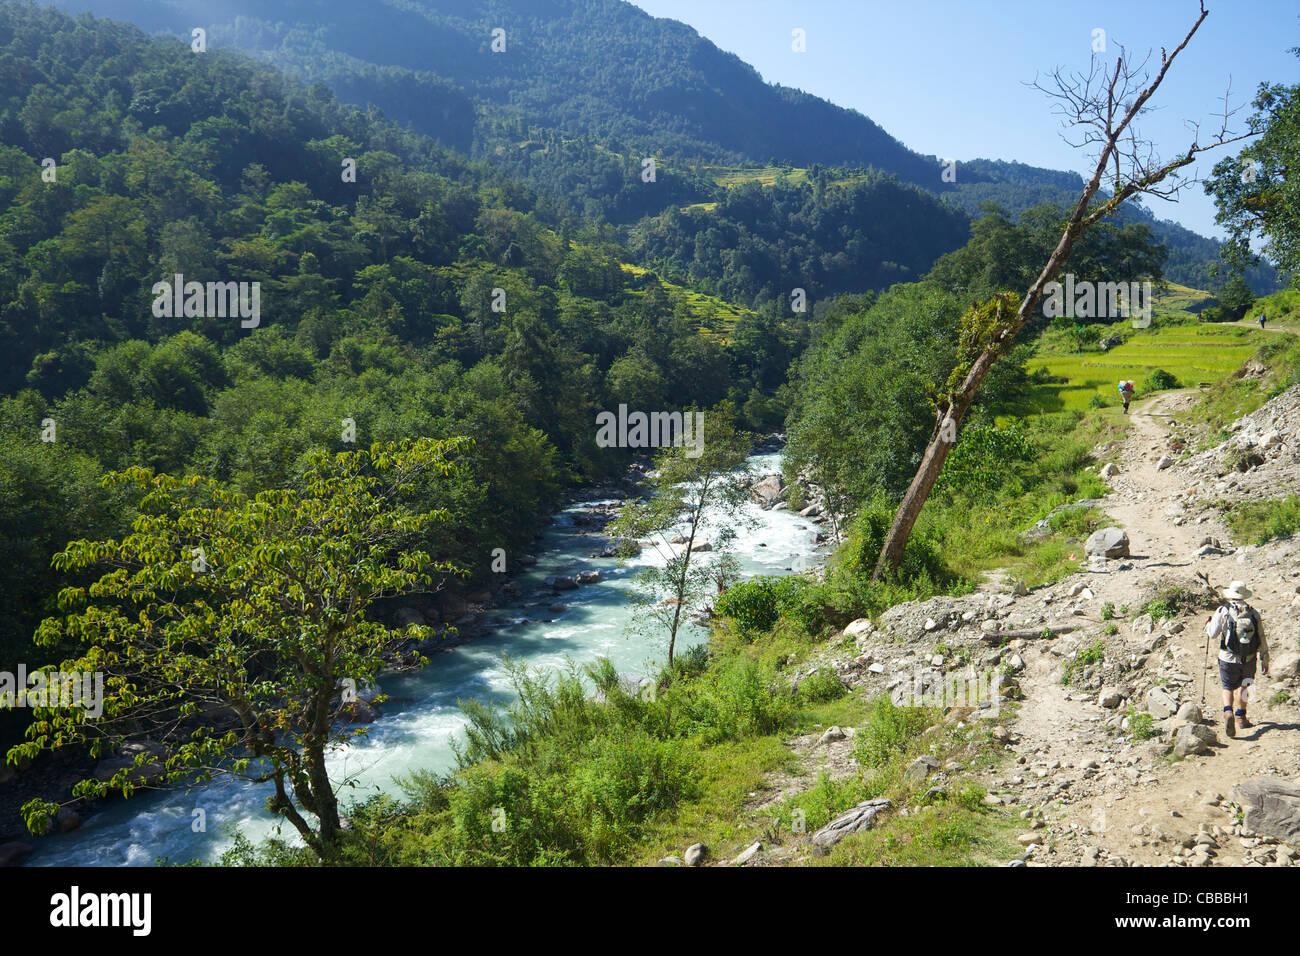 Trek from Ghandruk to Nayapul, Annapurna Sanctuary Region, Nepal, Asia - Stock Image